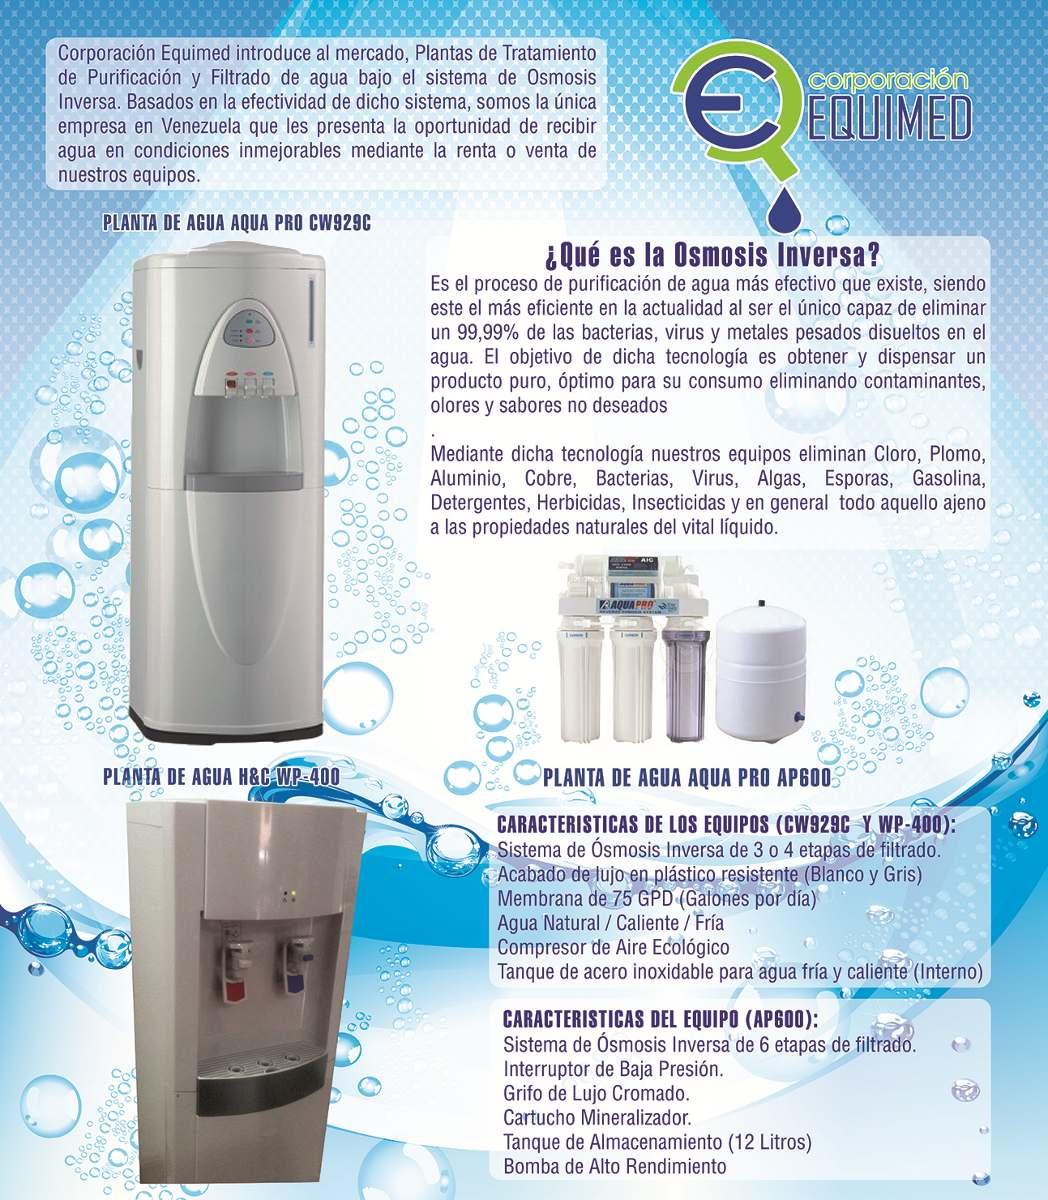 Planta de tratamiento de agua por osmosis inversa aquapro - Agua de osmosis ...